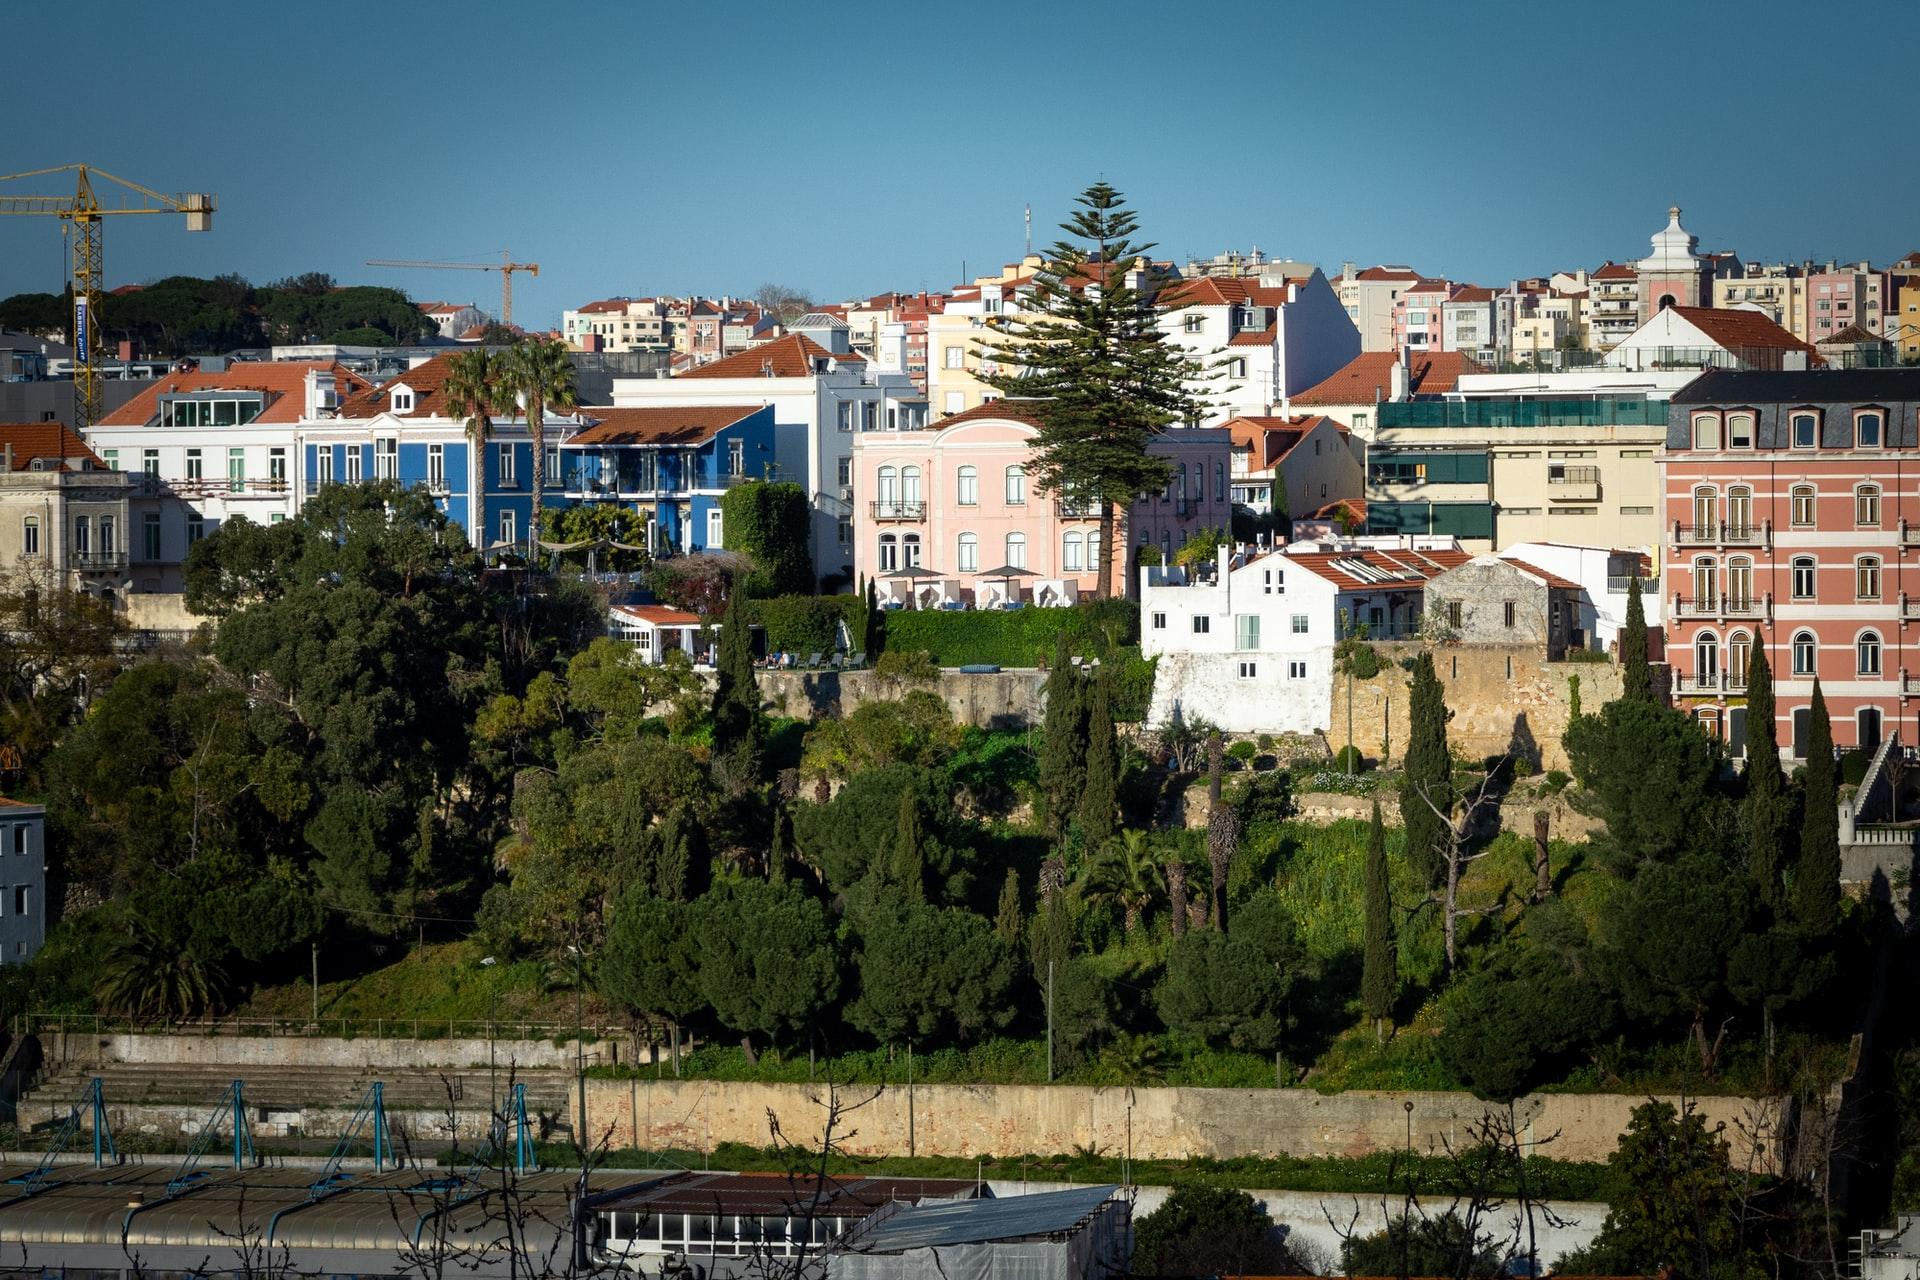 Arrendamento acessível em Lisboa